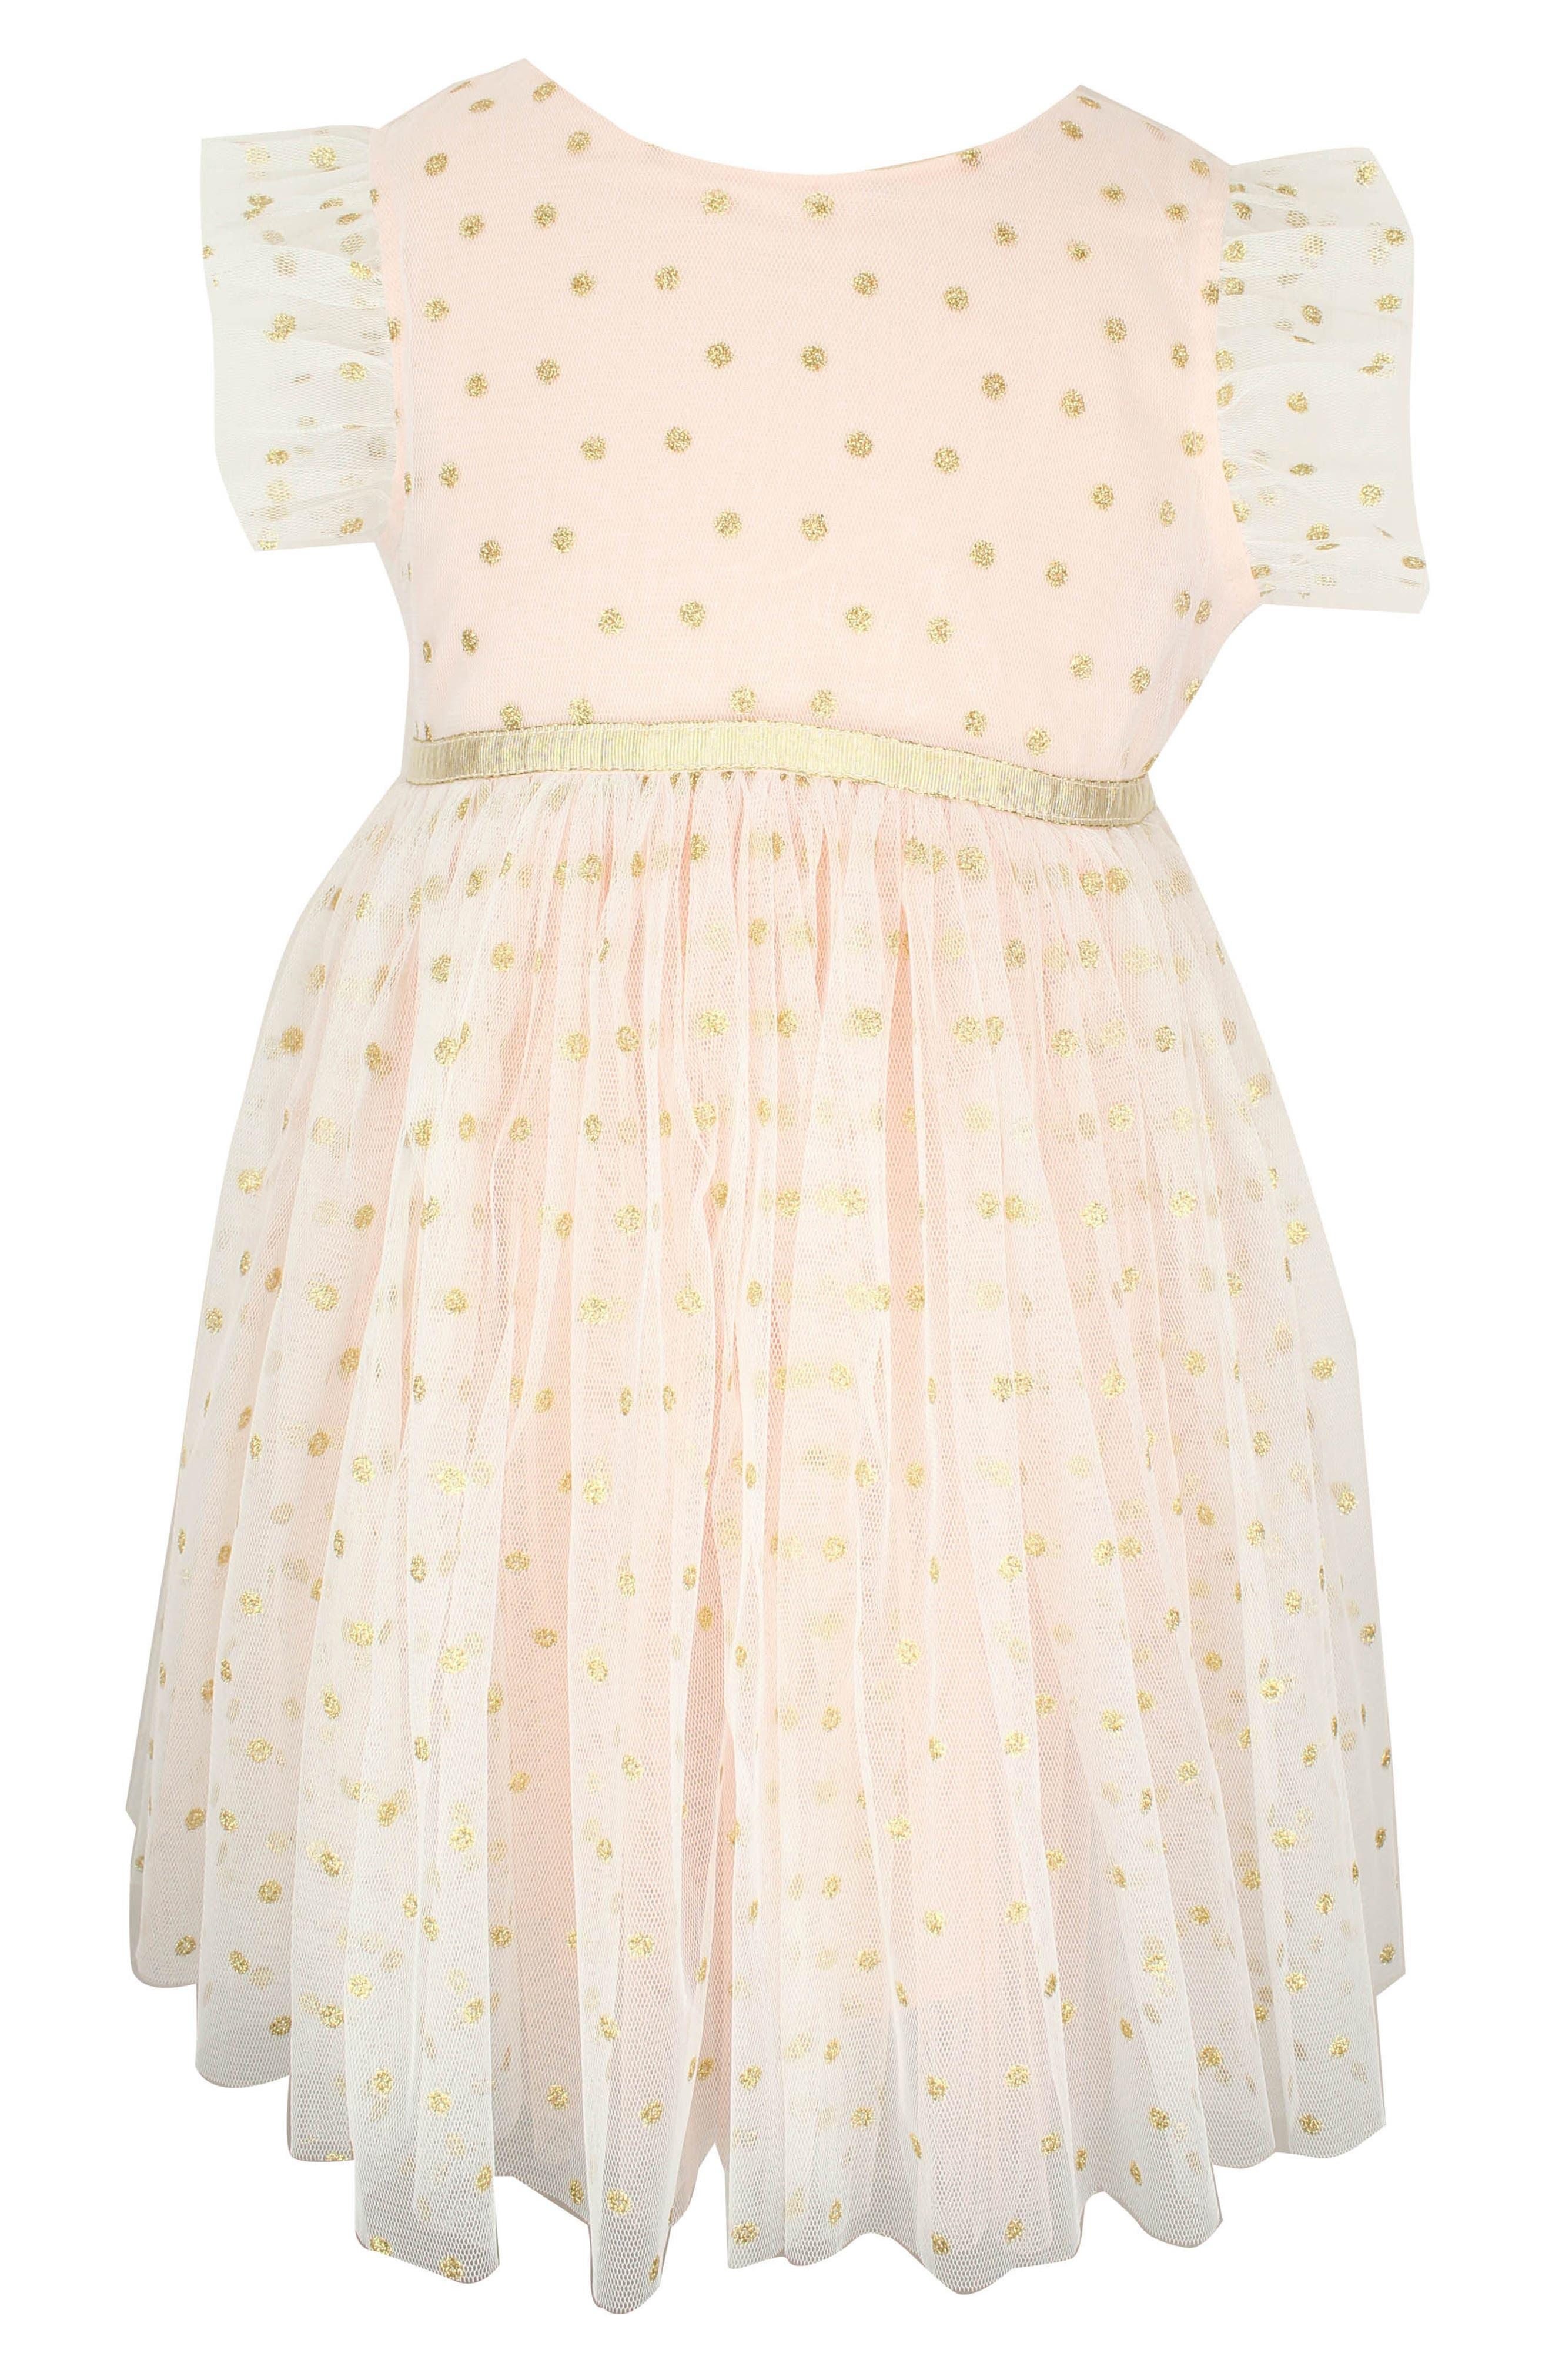 POPATU Dotted Tulle Dress, Main, color, PEACH